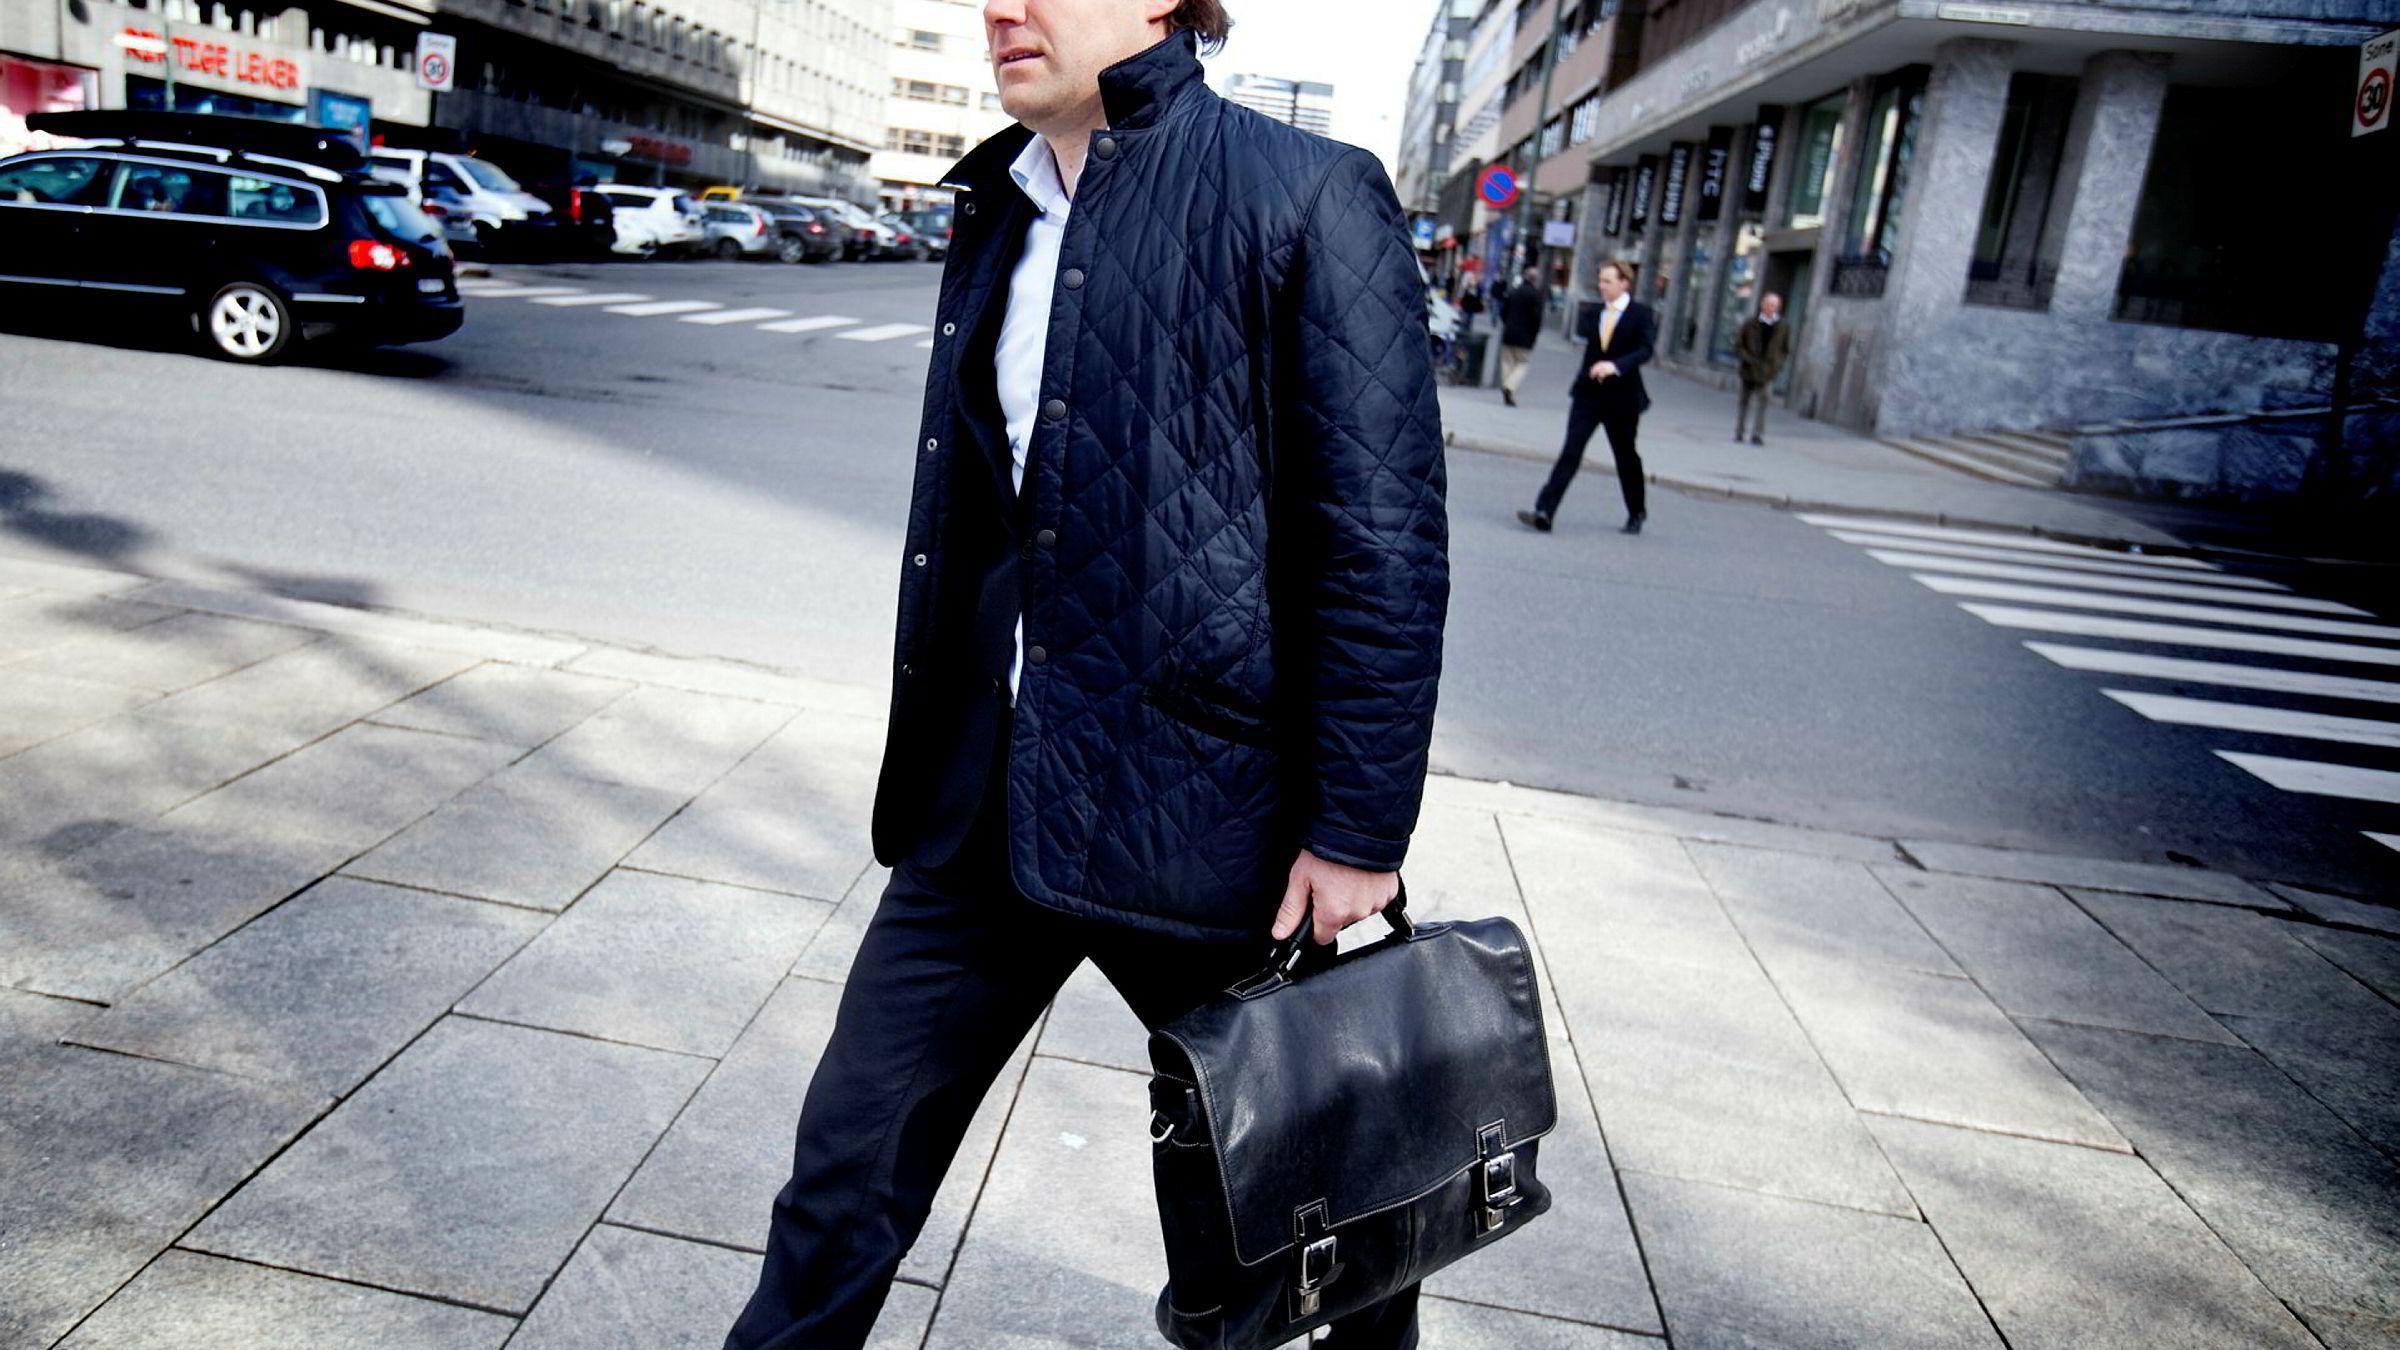 TGS-Nopec-sjef Kristian Johansen